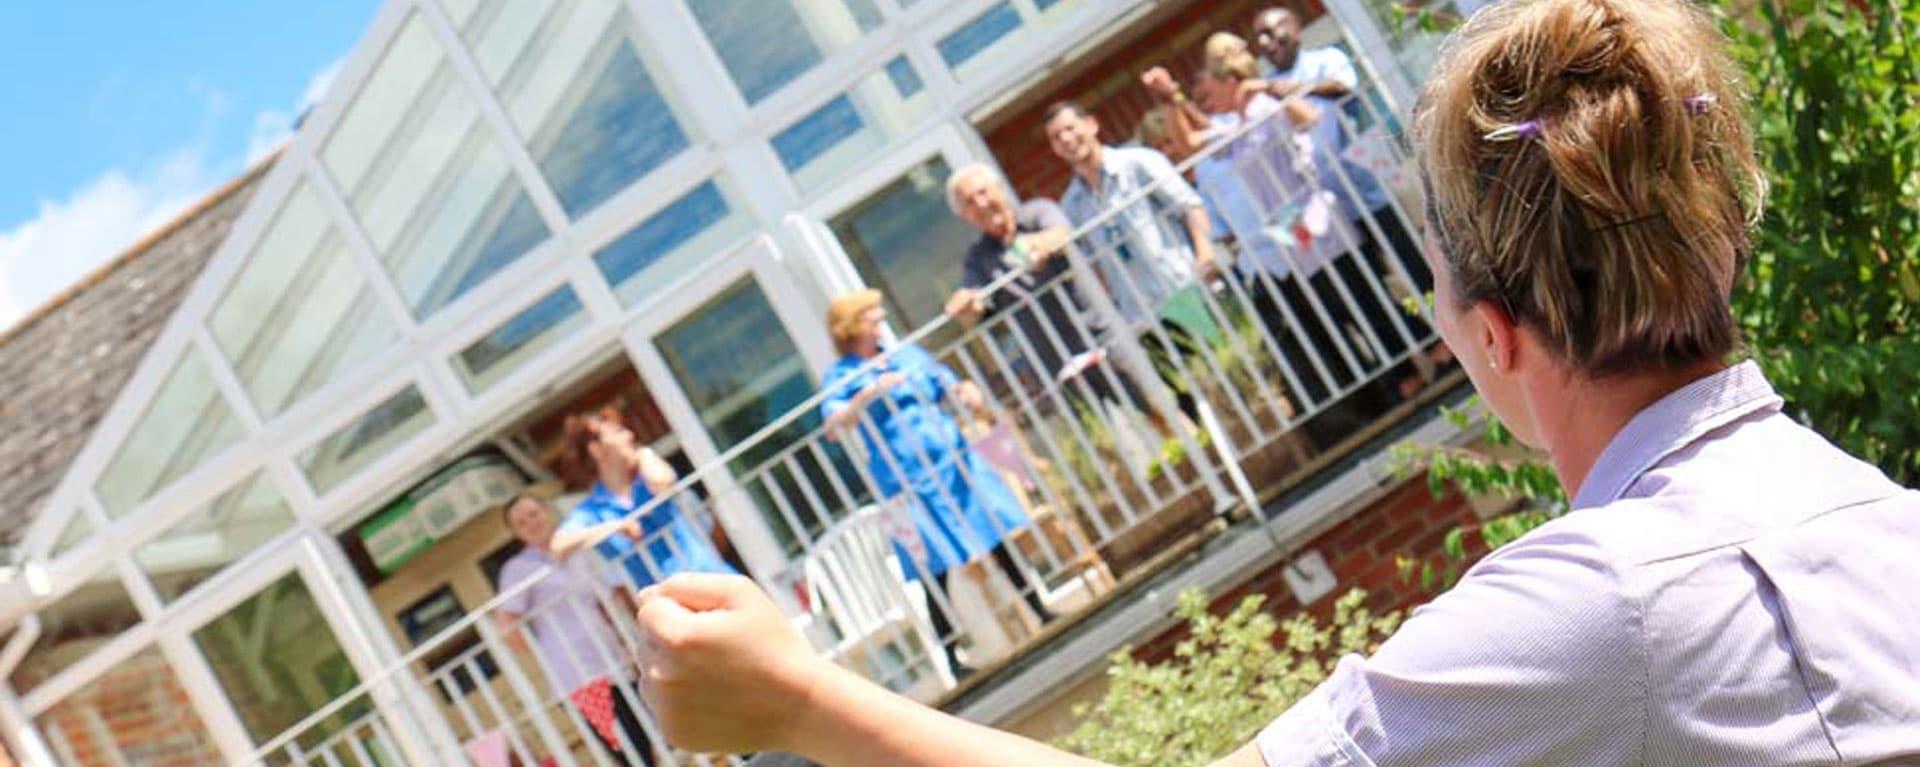 Staff cheering on the balcony